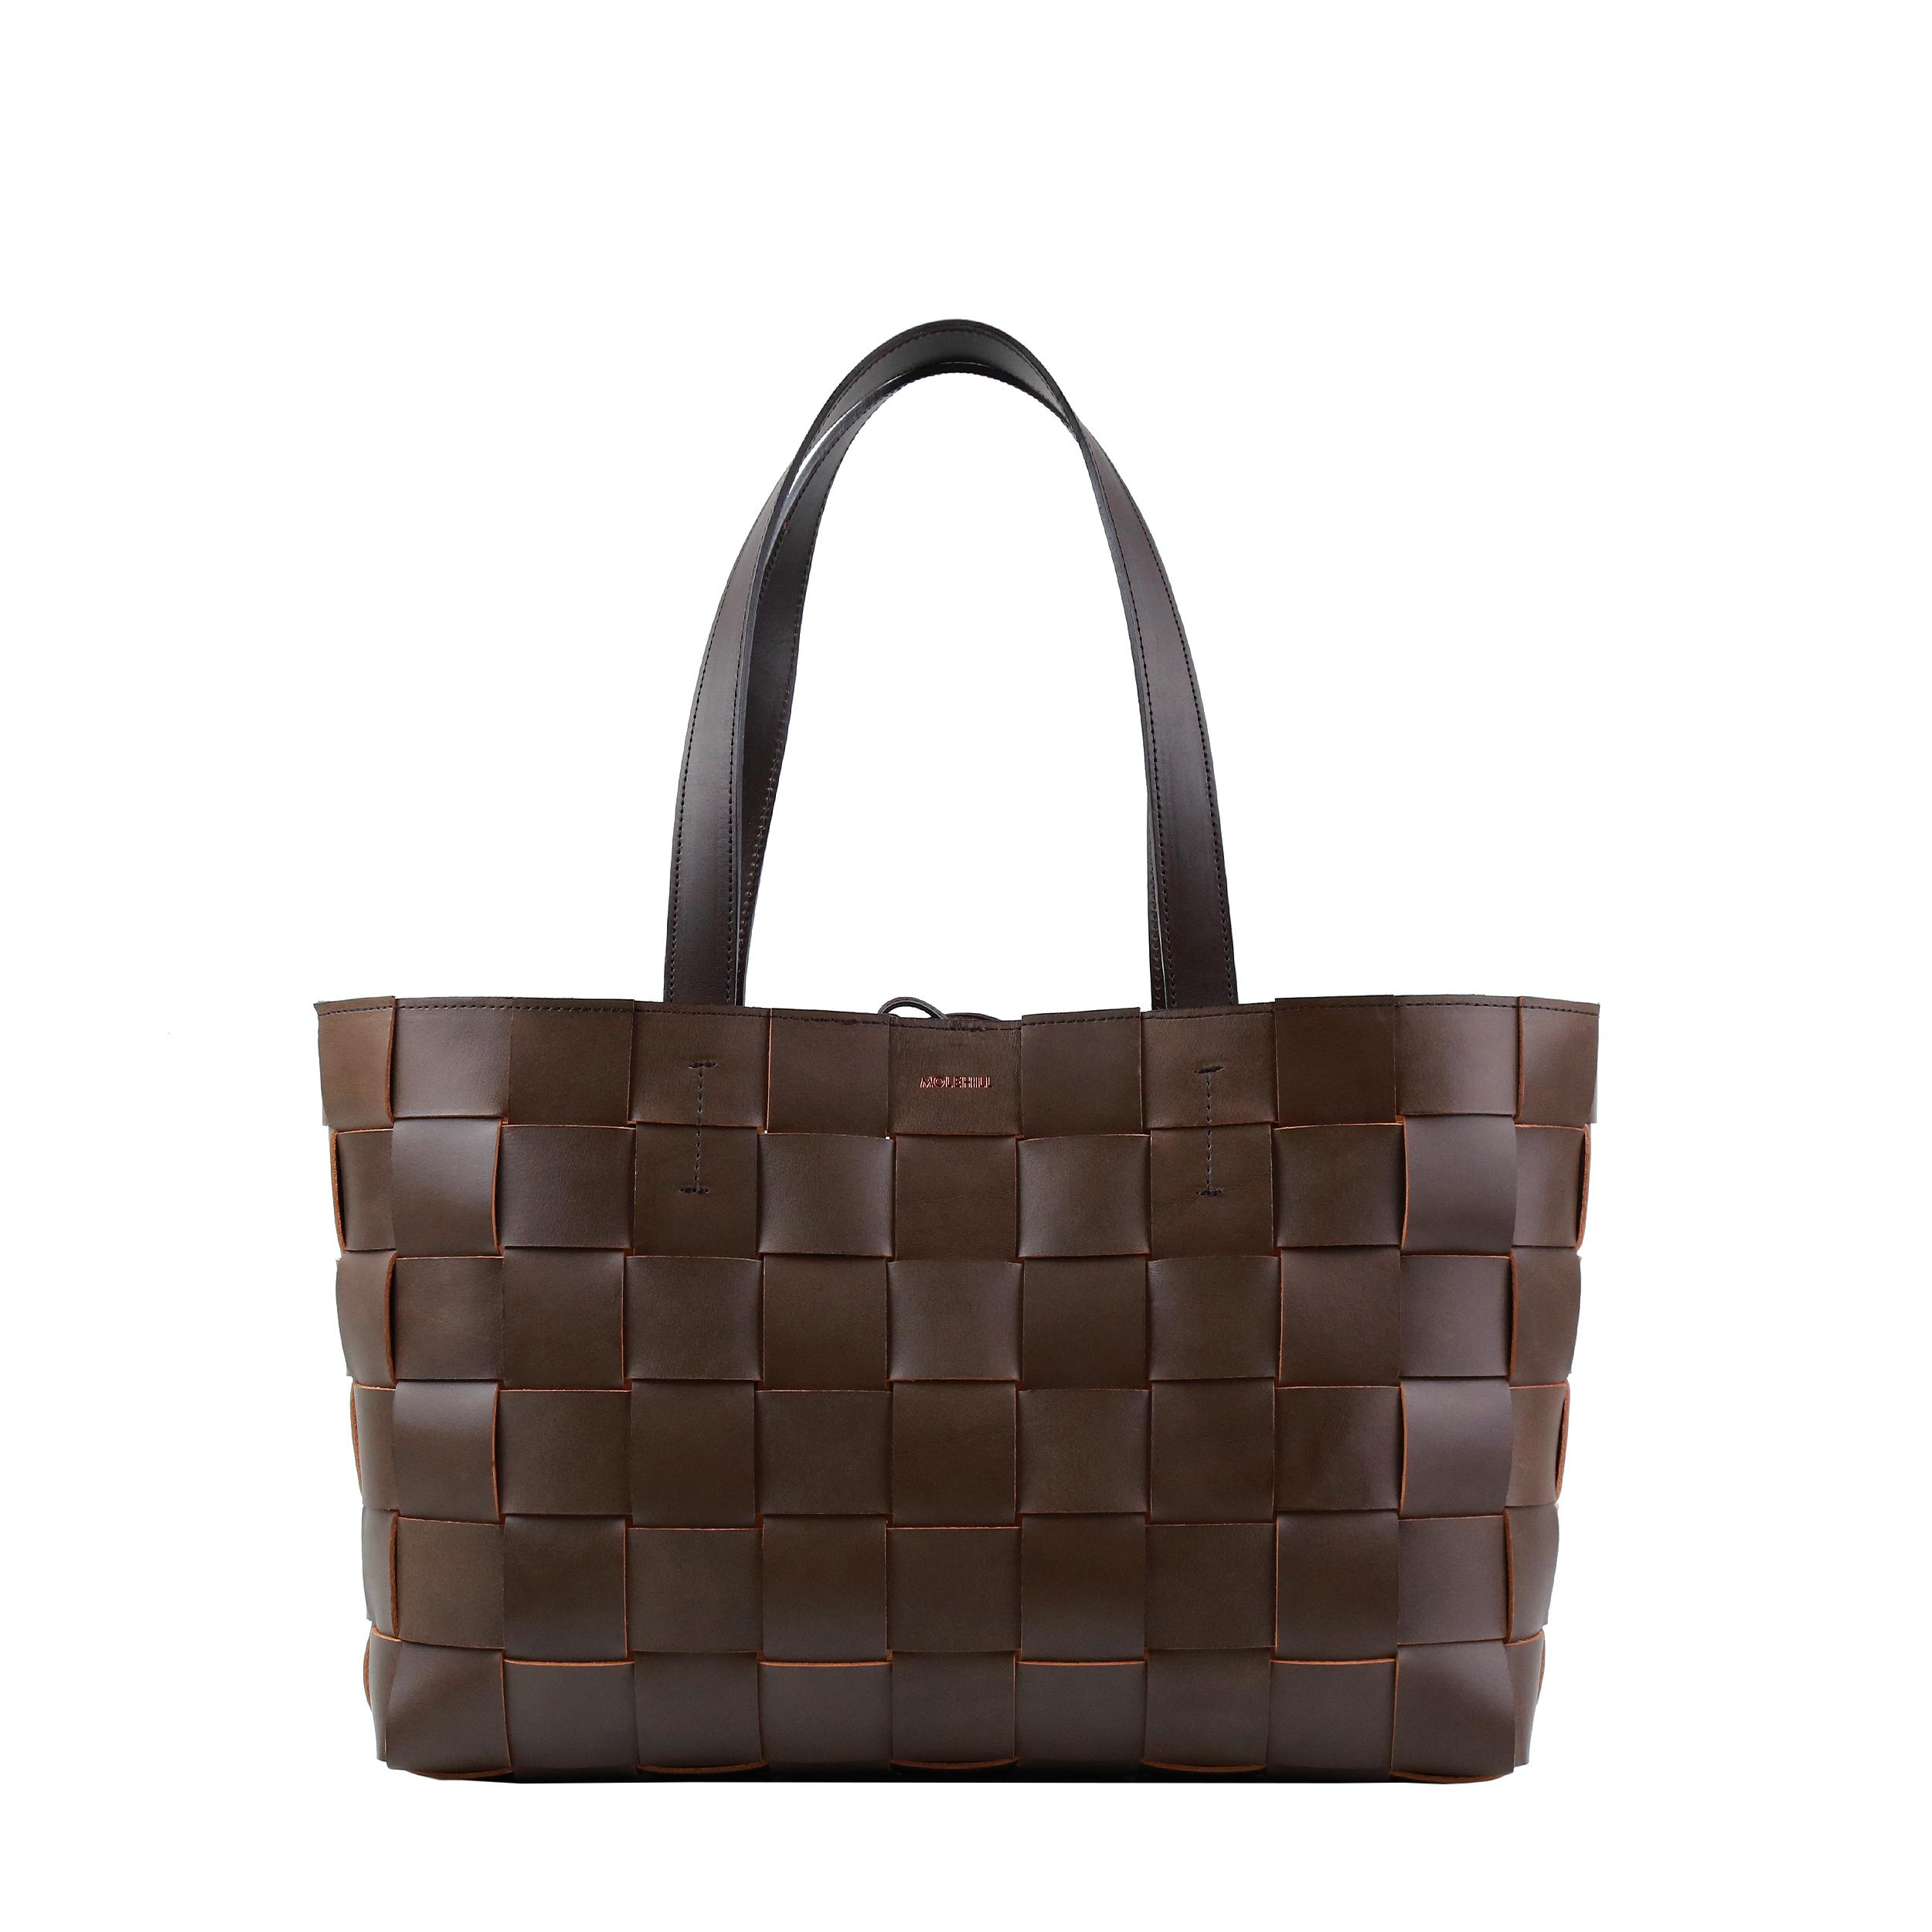 Pane Shopper Woven Bag Light Chocolate-1